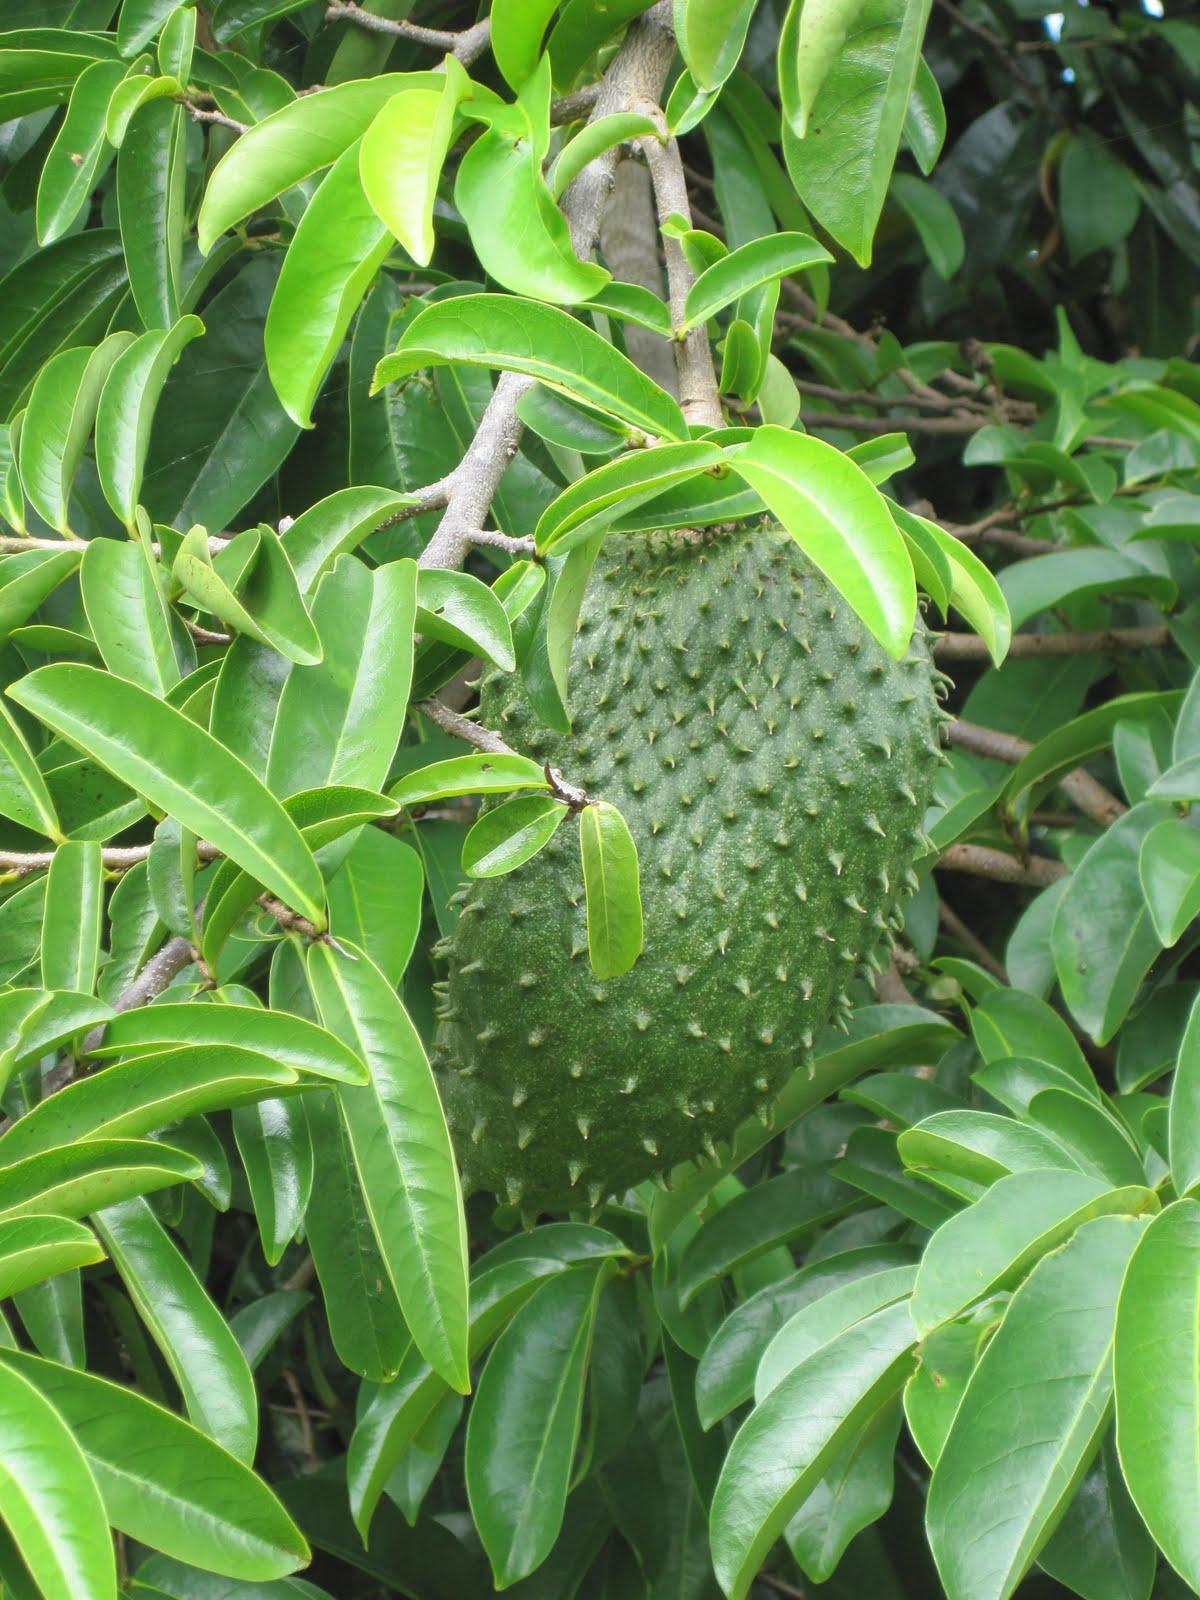 Manfaat daun sirsak dan khasiat daun sirsak  Herbal